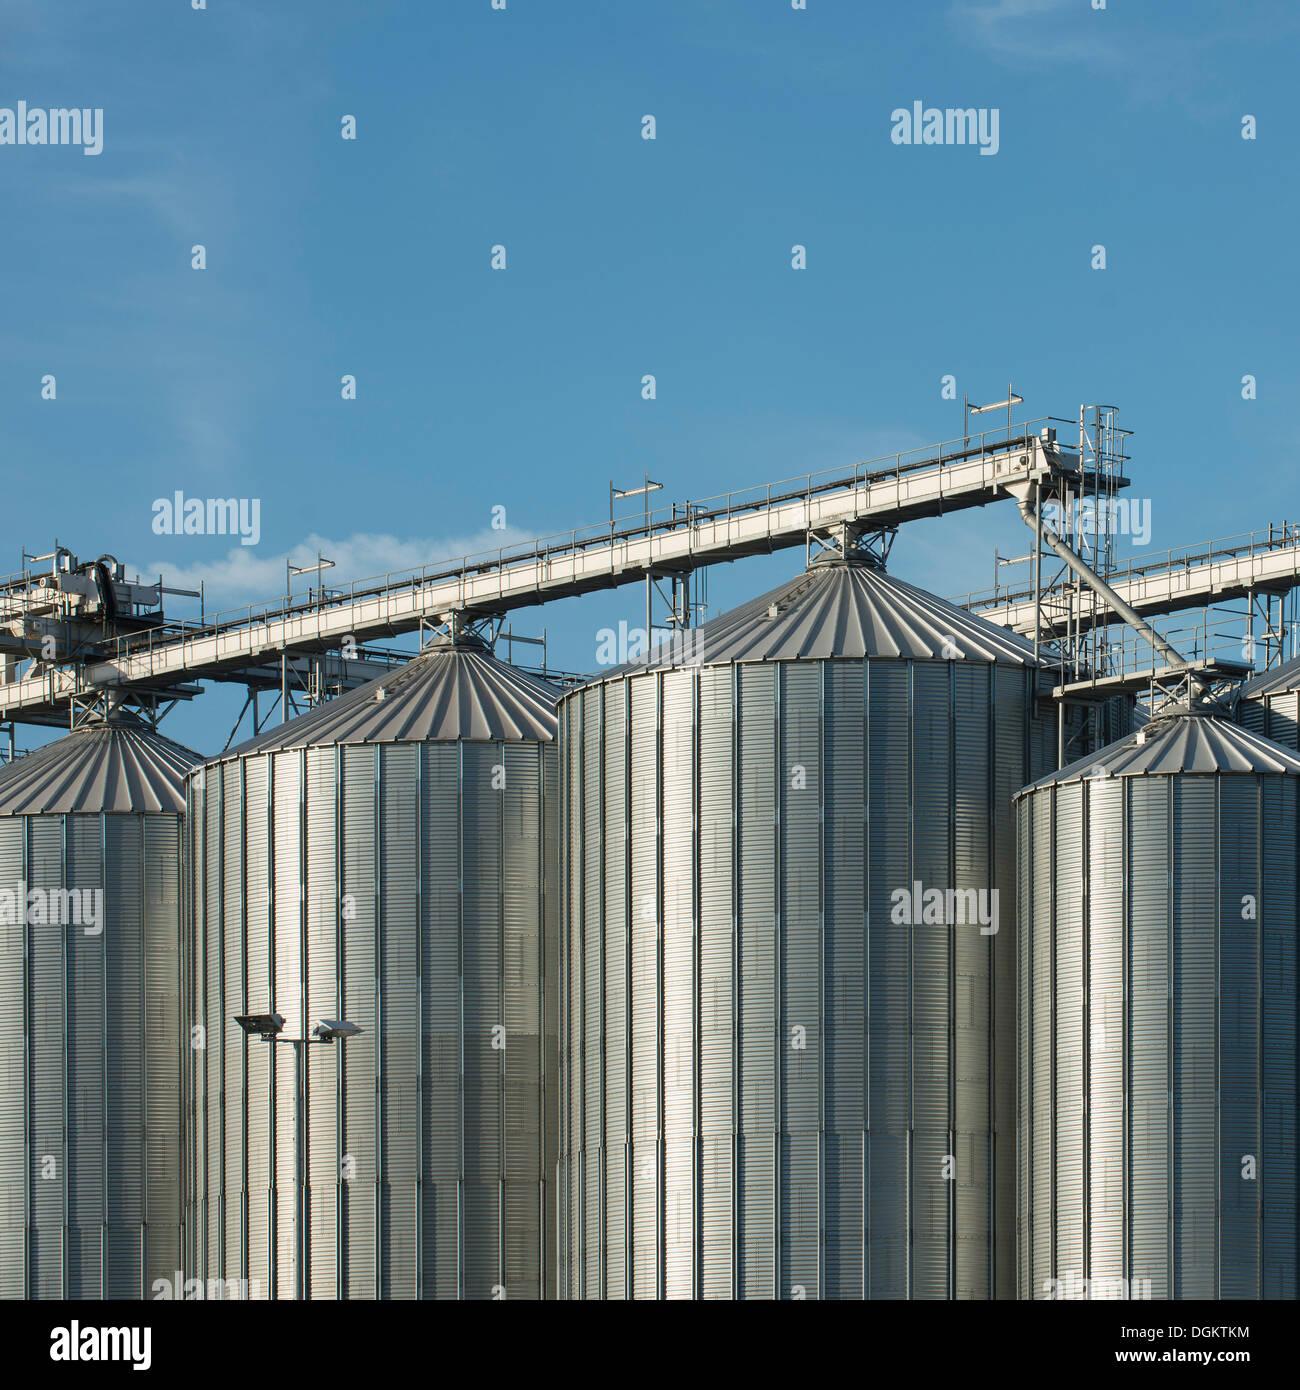 Silos, stockage de masse, les installations industrielles, Koblenz, Rhénanie-Palatinat, PublicGround Photo Stock